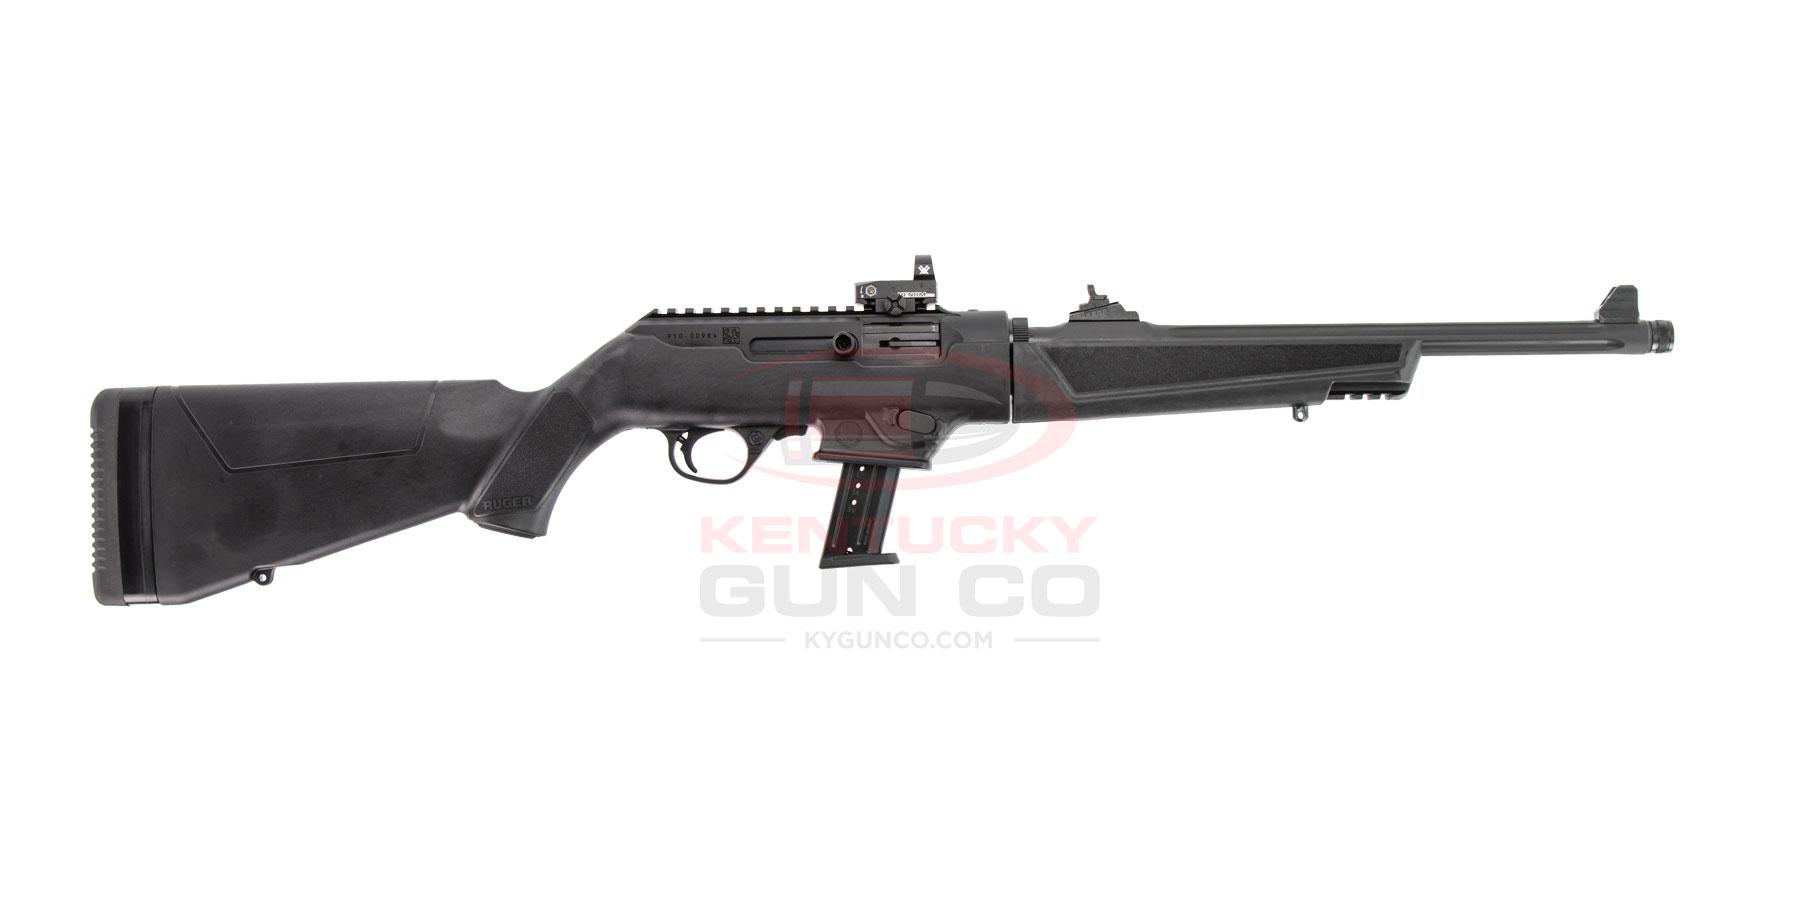 PC Carbine w/ Vortex Venom